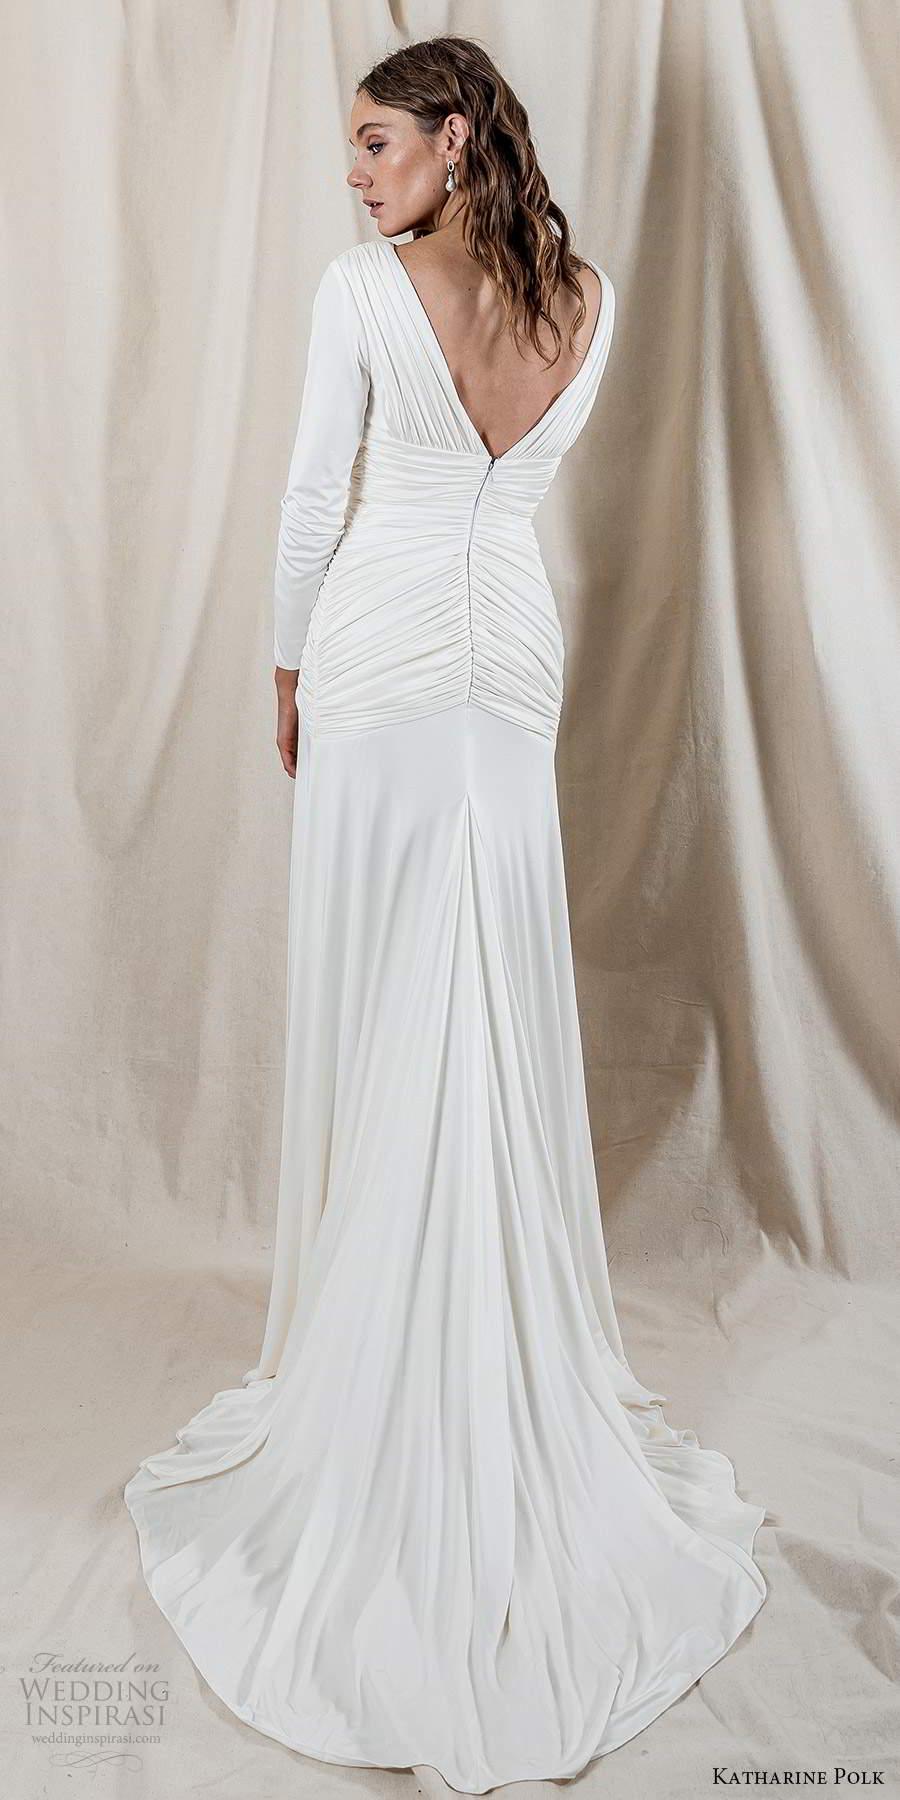 katharine polk 2021 bridal long sleeve v neckline ruched bodice clean minimalist column wedding dress chapel train (5) bv